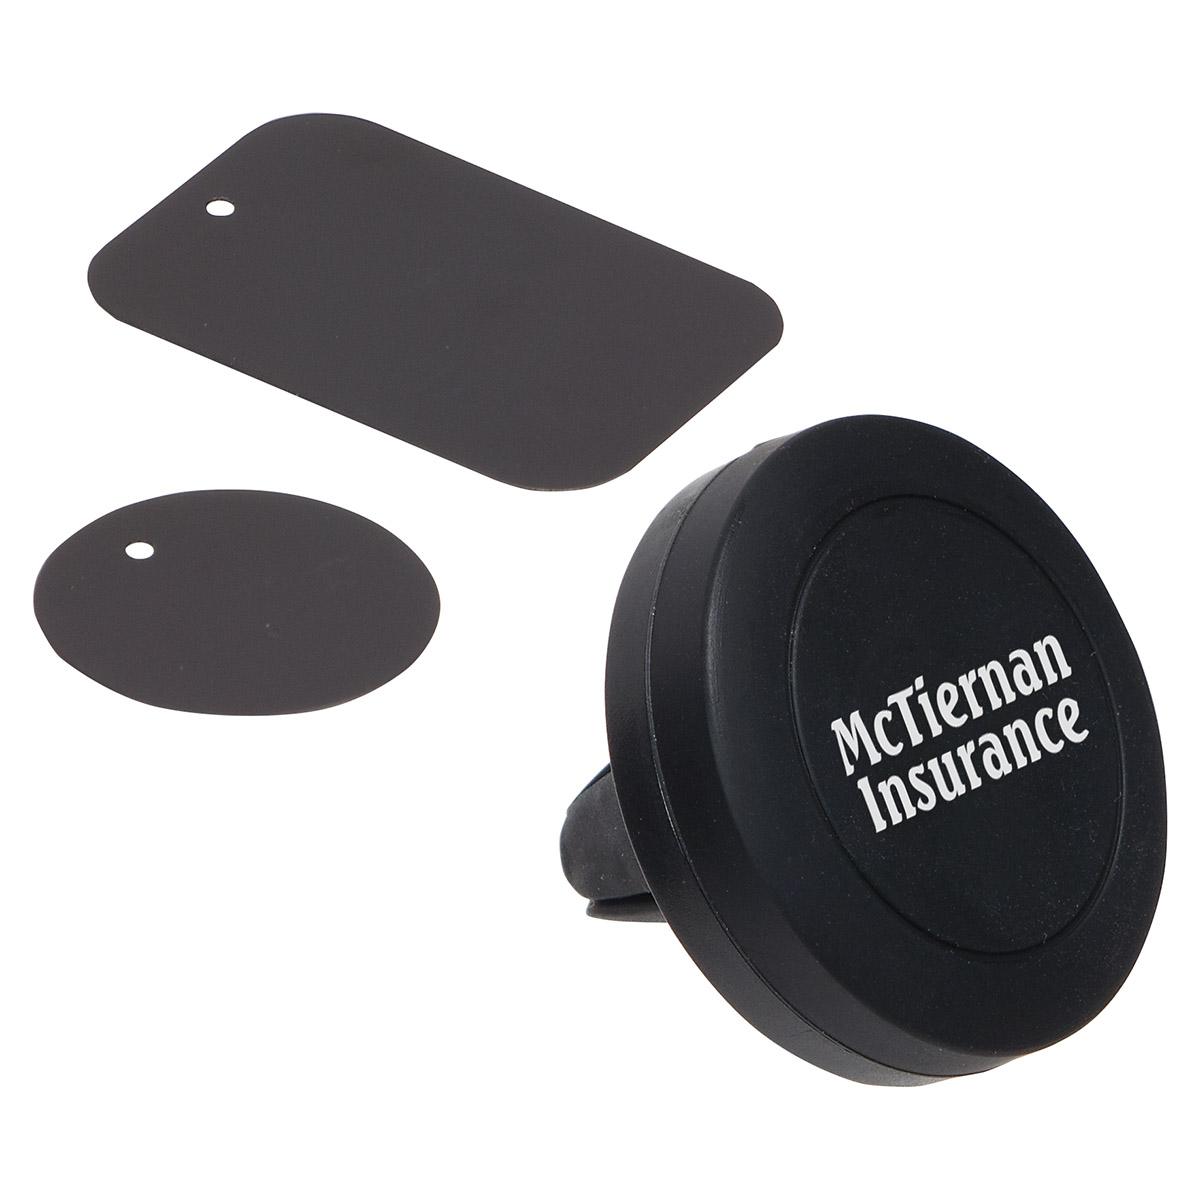 Magna Grip Vent Clip & Phone Stand, WAU-MV17 - 1 Colour Imprint